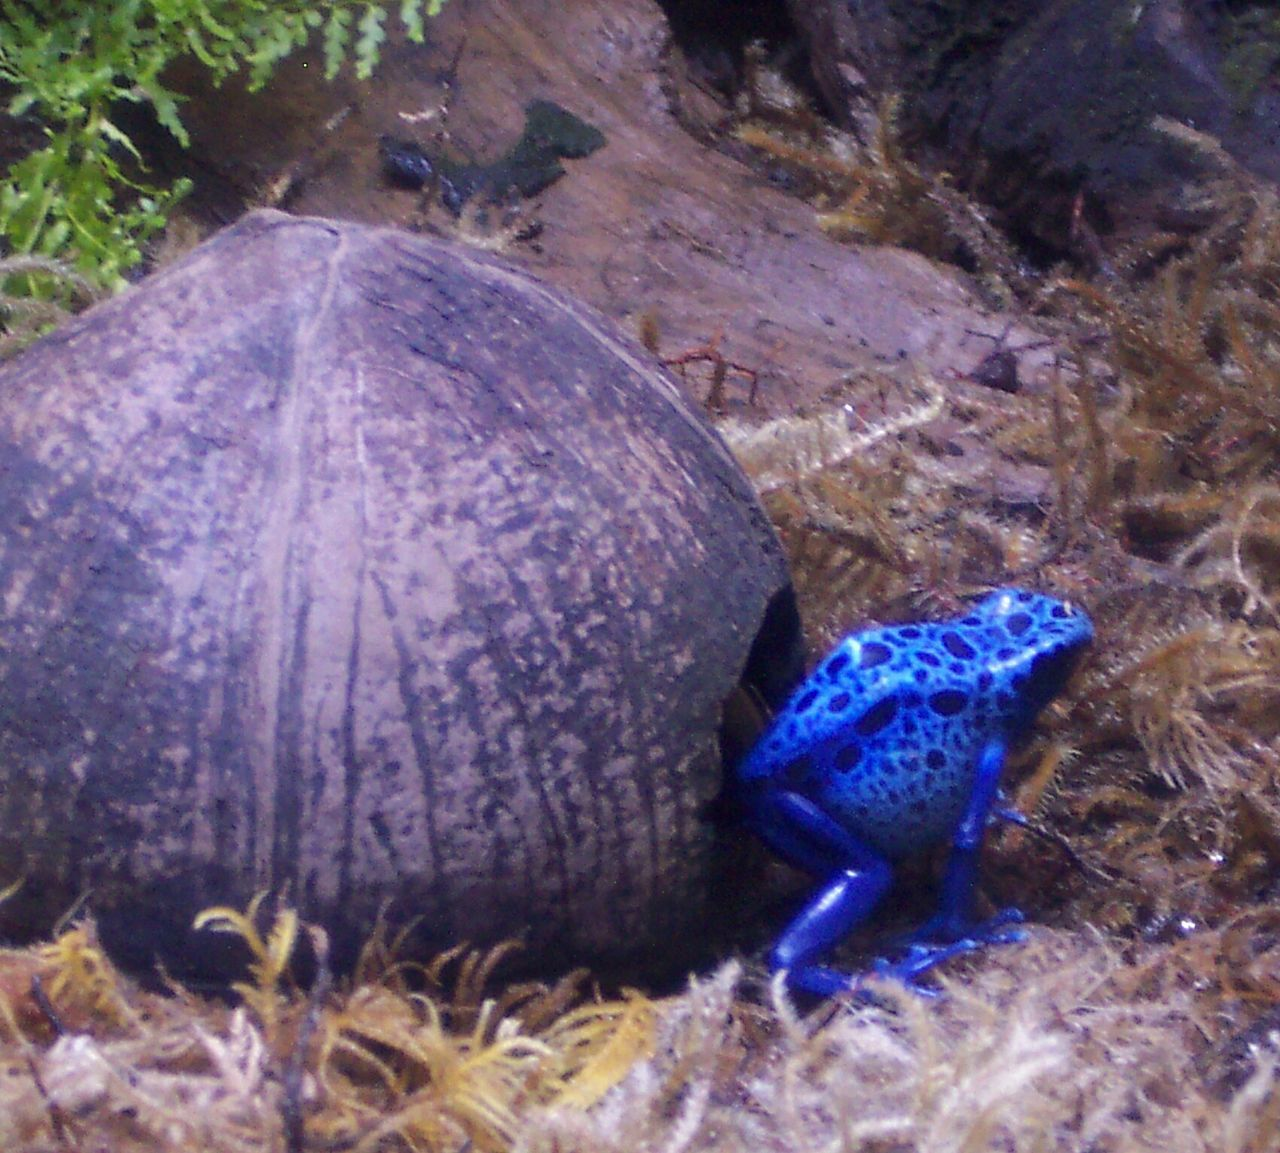 Blue Frog Poisonous Frog Exotic Creatures Amphibian Nature Close-up